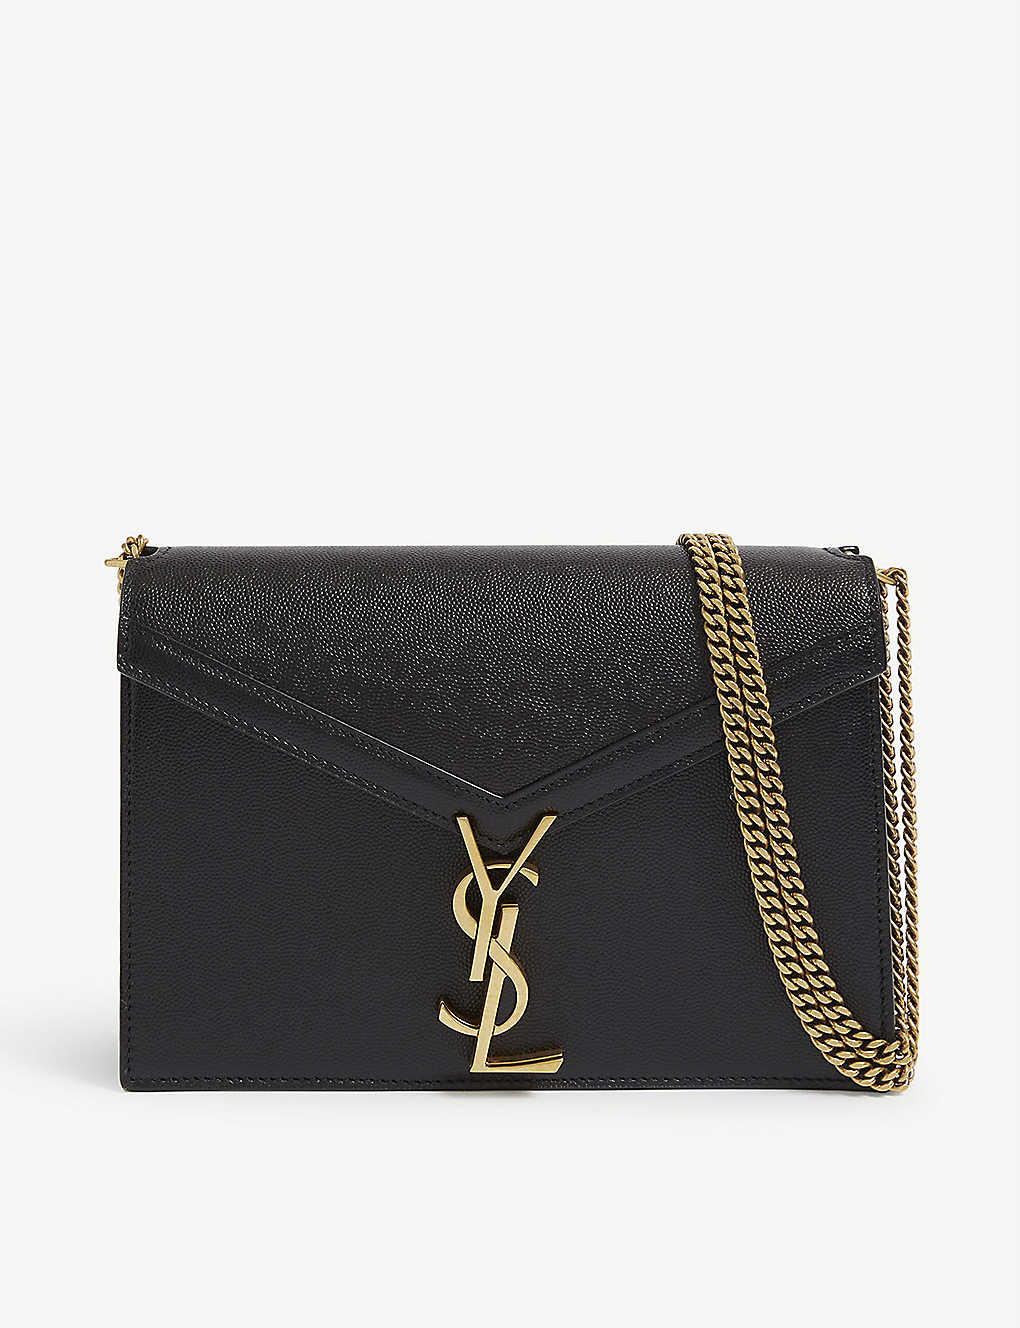 SAINT LAURENT: Cassandra leather shoulder bag